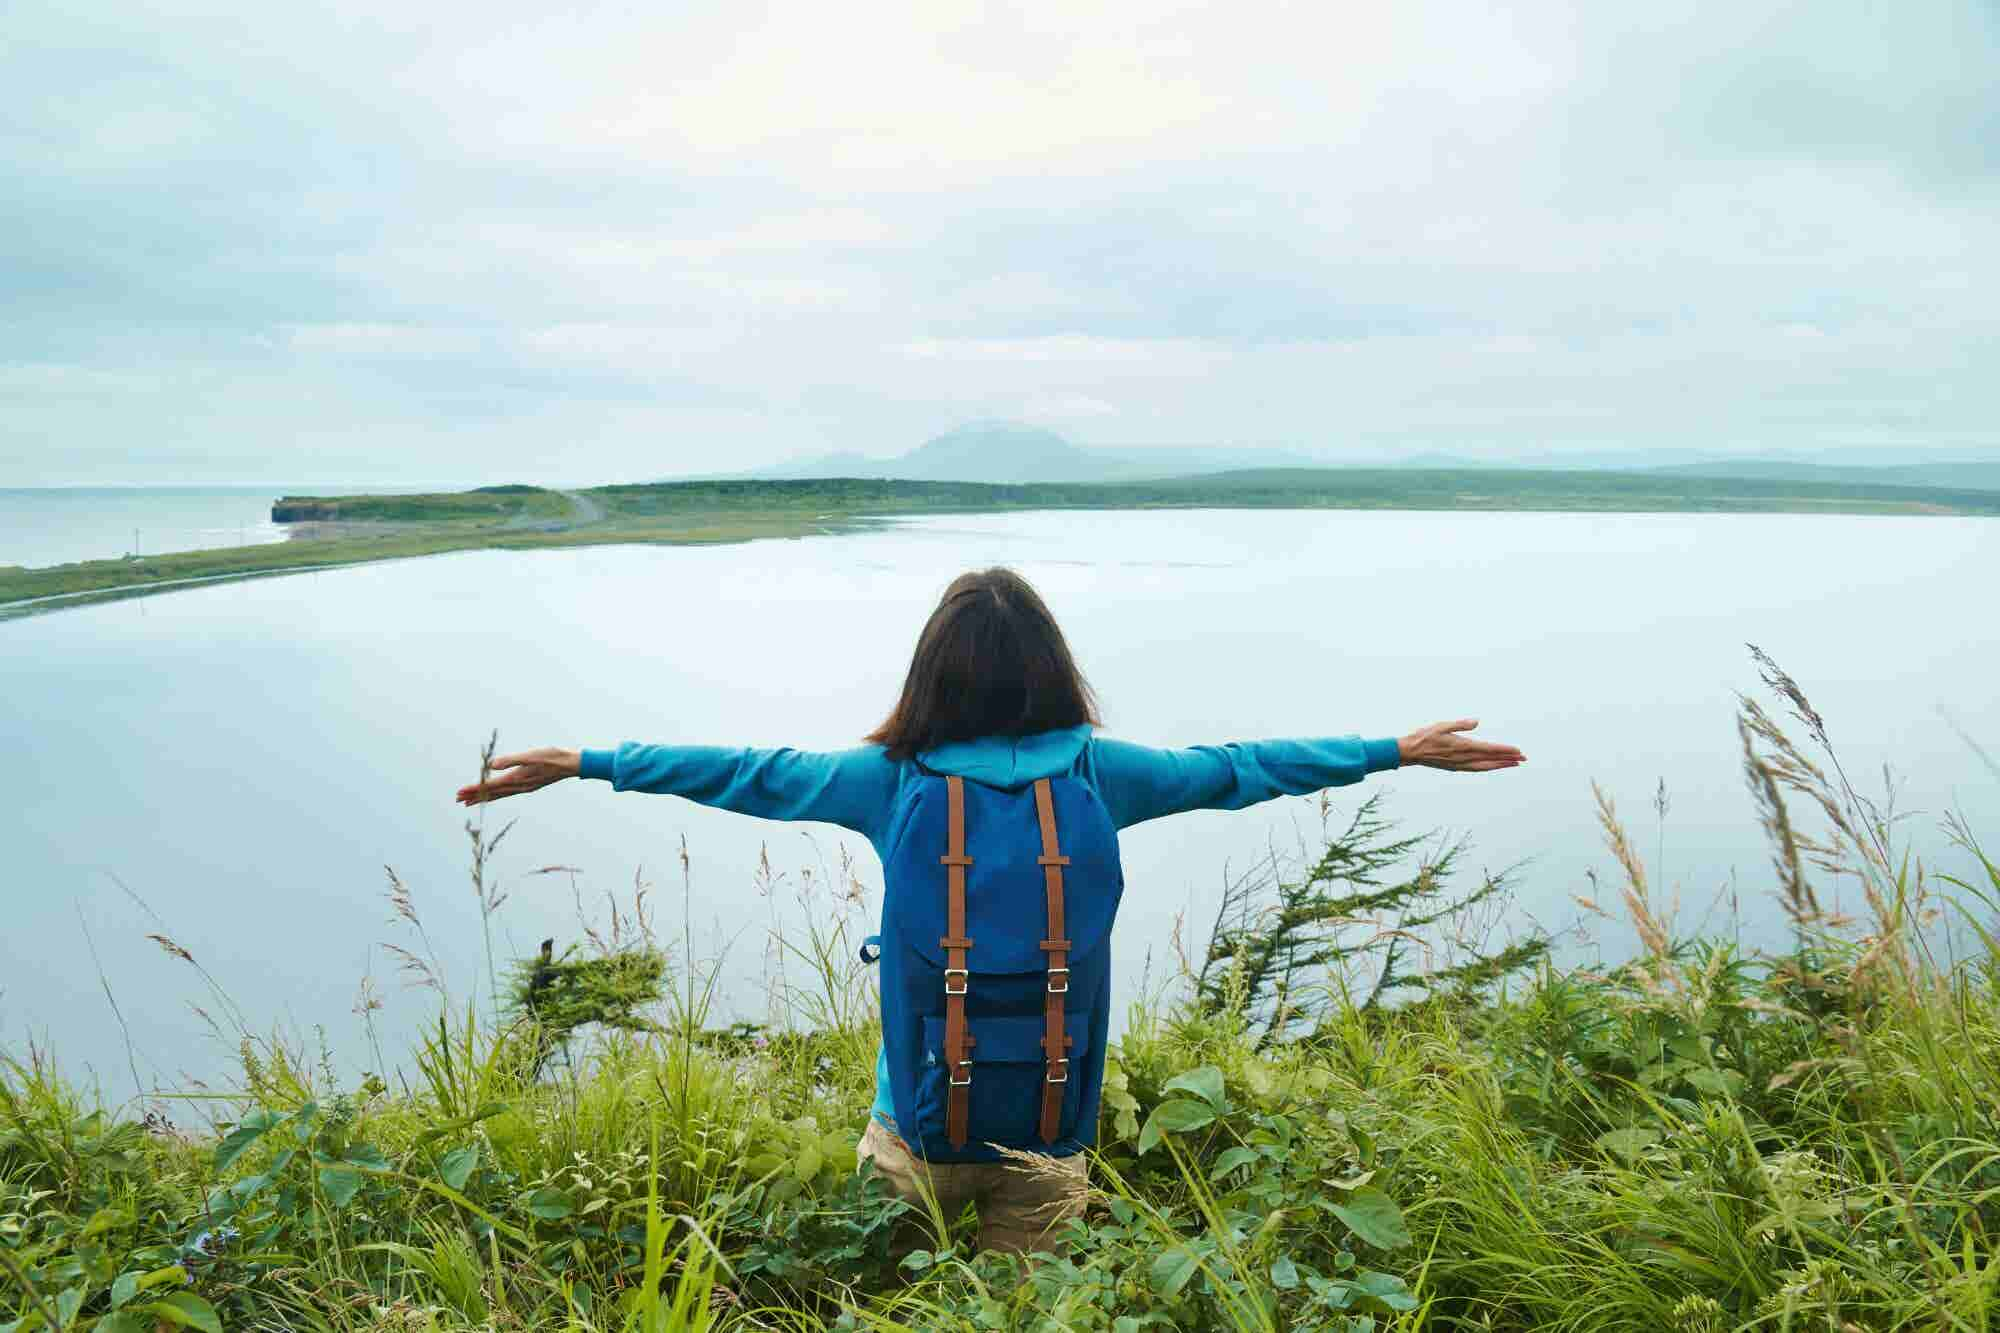 10 características básicas para tener éxito como emprendedor turístico sostenible